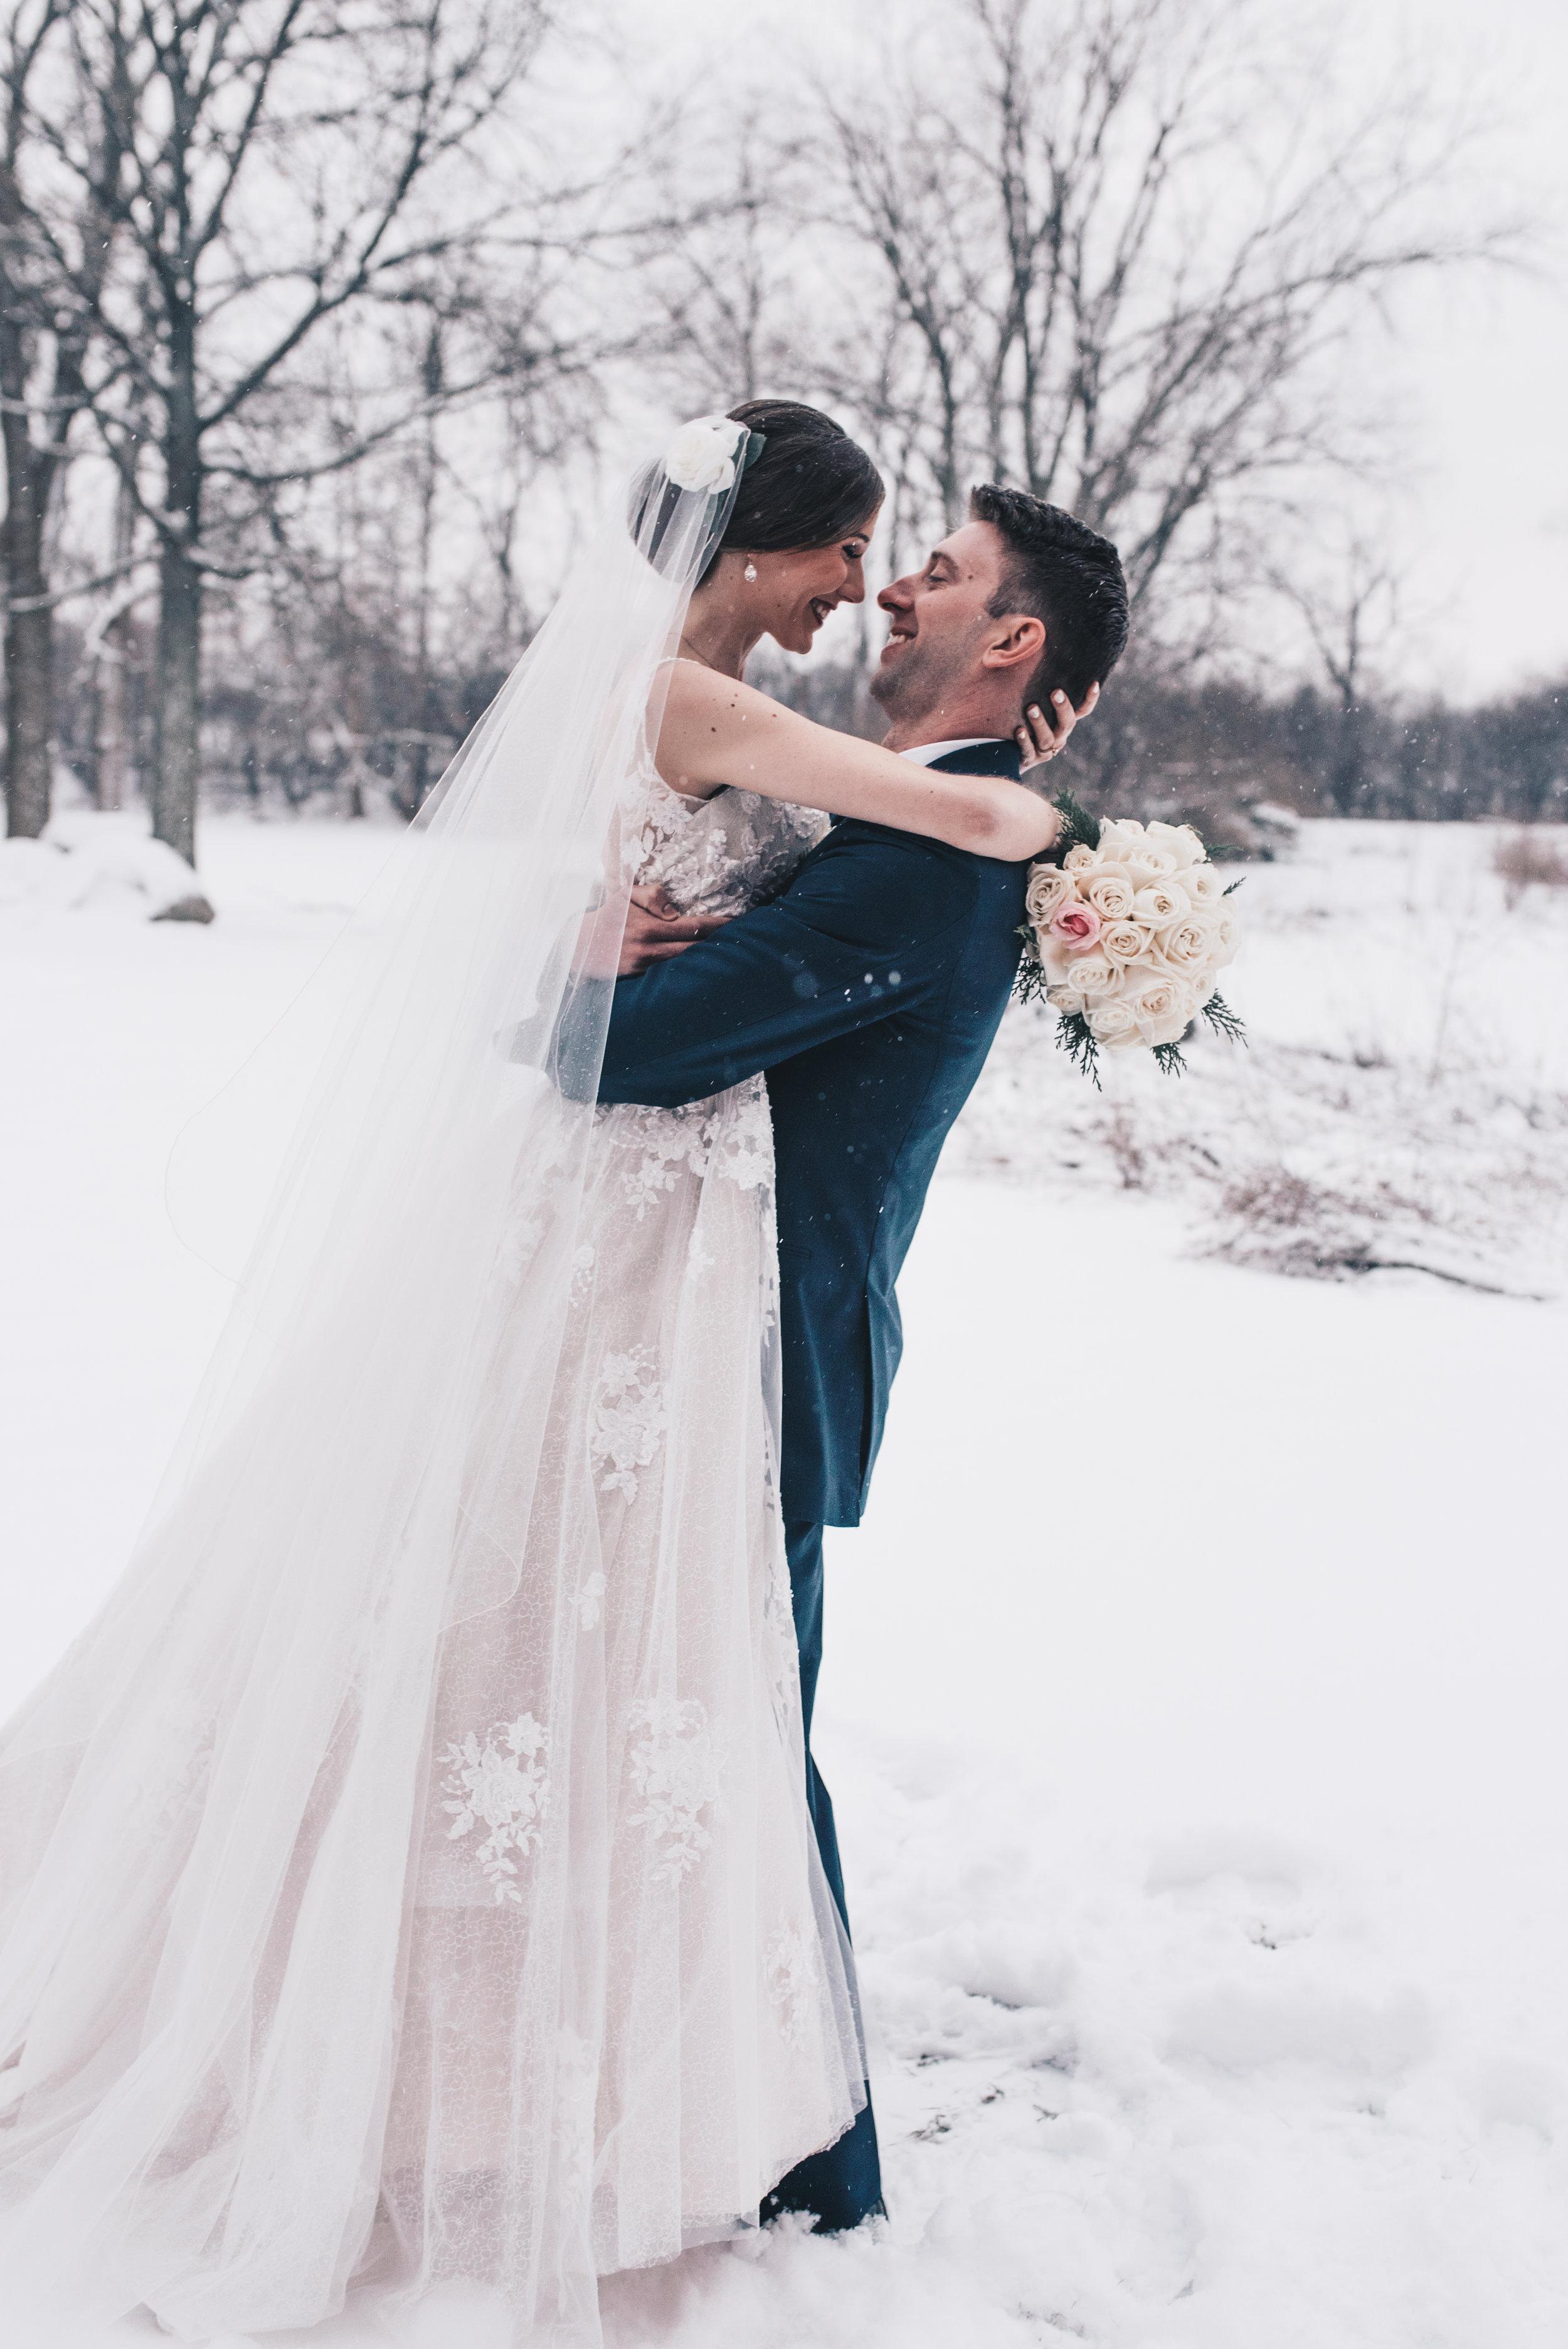 Winter Wedding, Chicago Winter Wedding, Chicago Wedding Photographer, Illinois Wedding, Illinois Wedding Photographer, Classy Modern Wedding, Bride and Groom Photography, Bride and Groom Photos